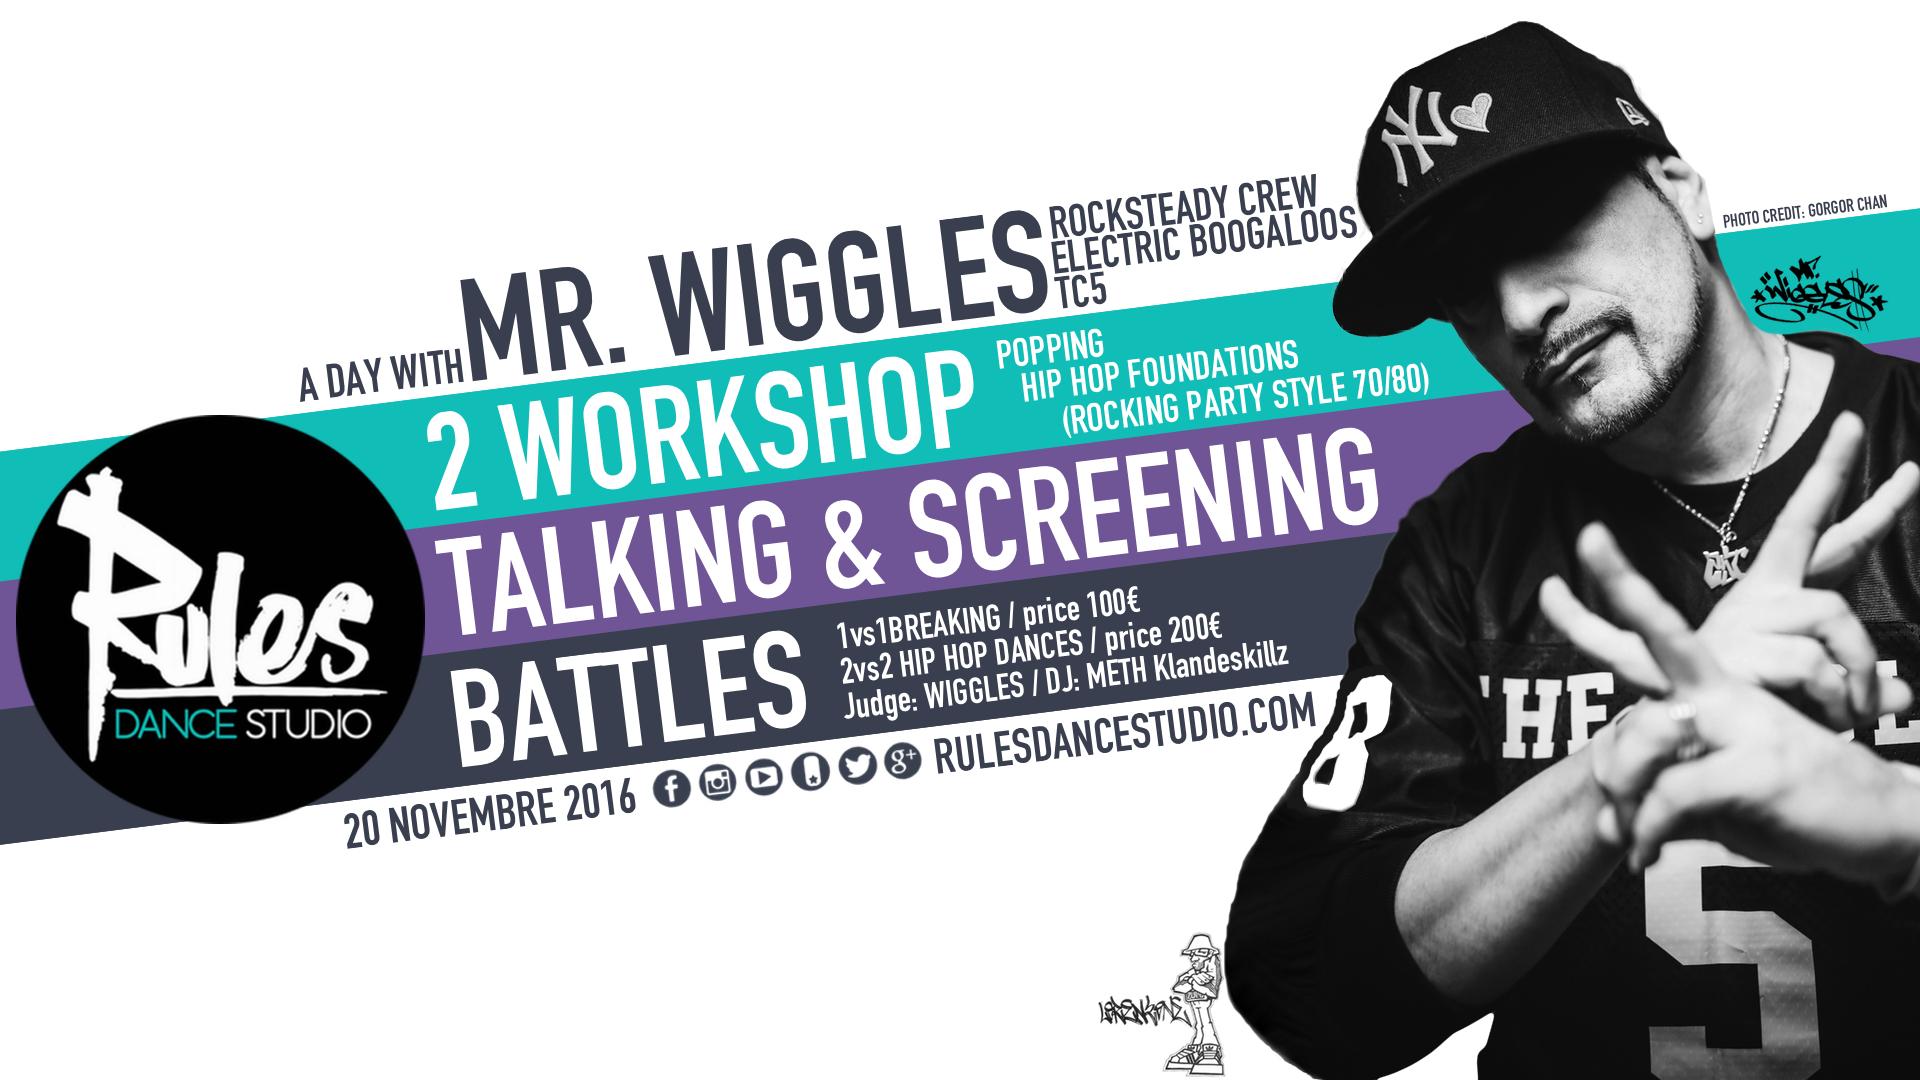 wiggles-ok2